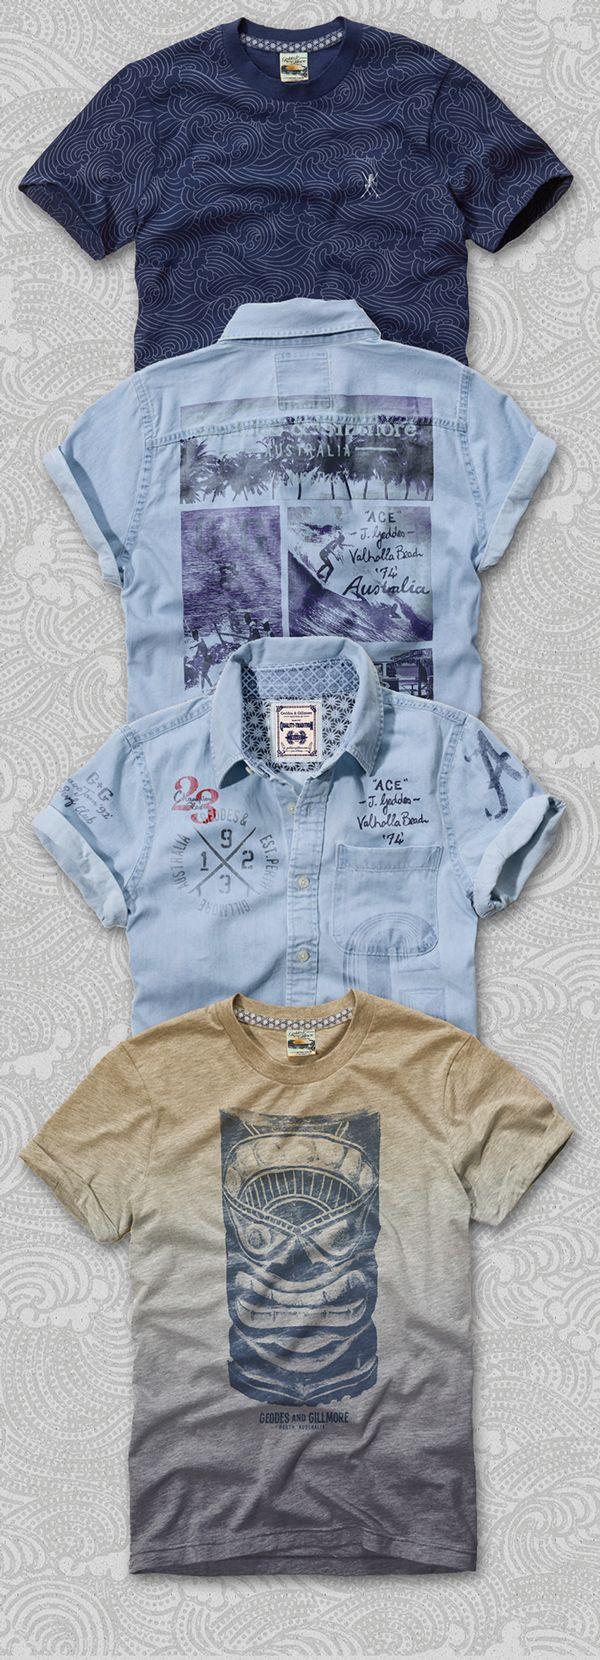 Gold Coast - Menswear  Fashion Branding & Graphics by Richard Schonegevel, via Behance http://happyluckyfun.com/140106/3926460/recent-work/gold-coast-menswear-fashion-branding-graphics